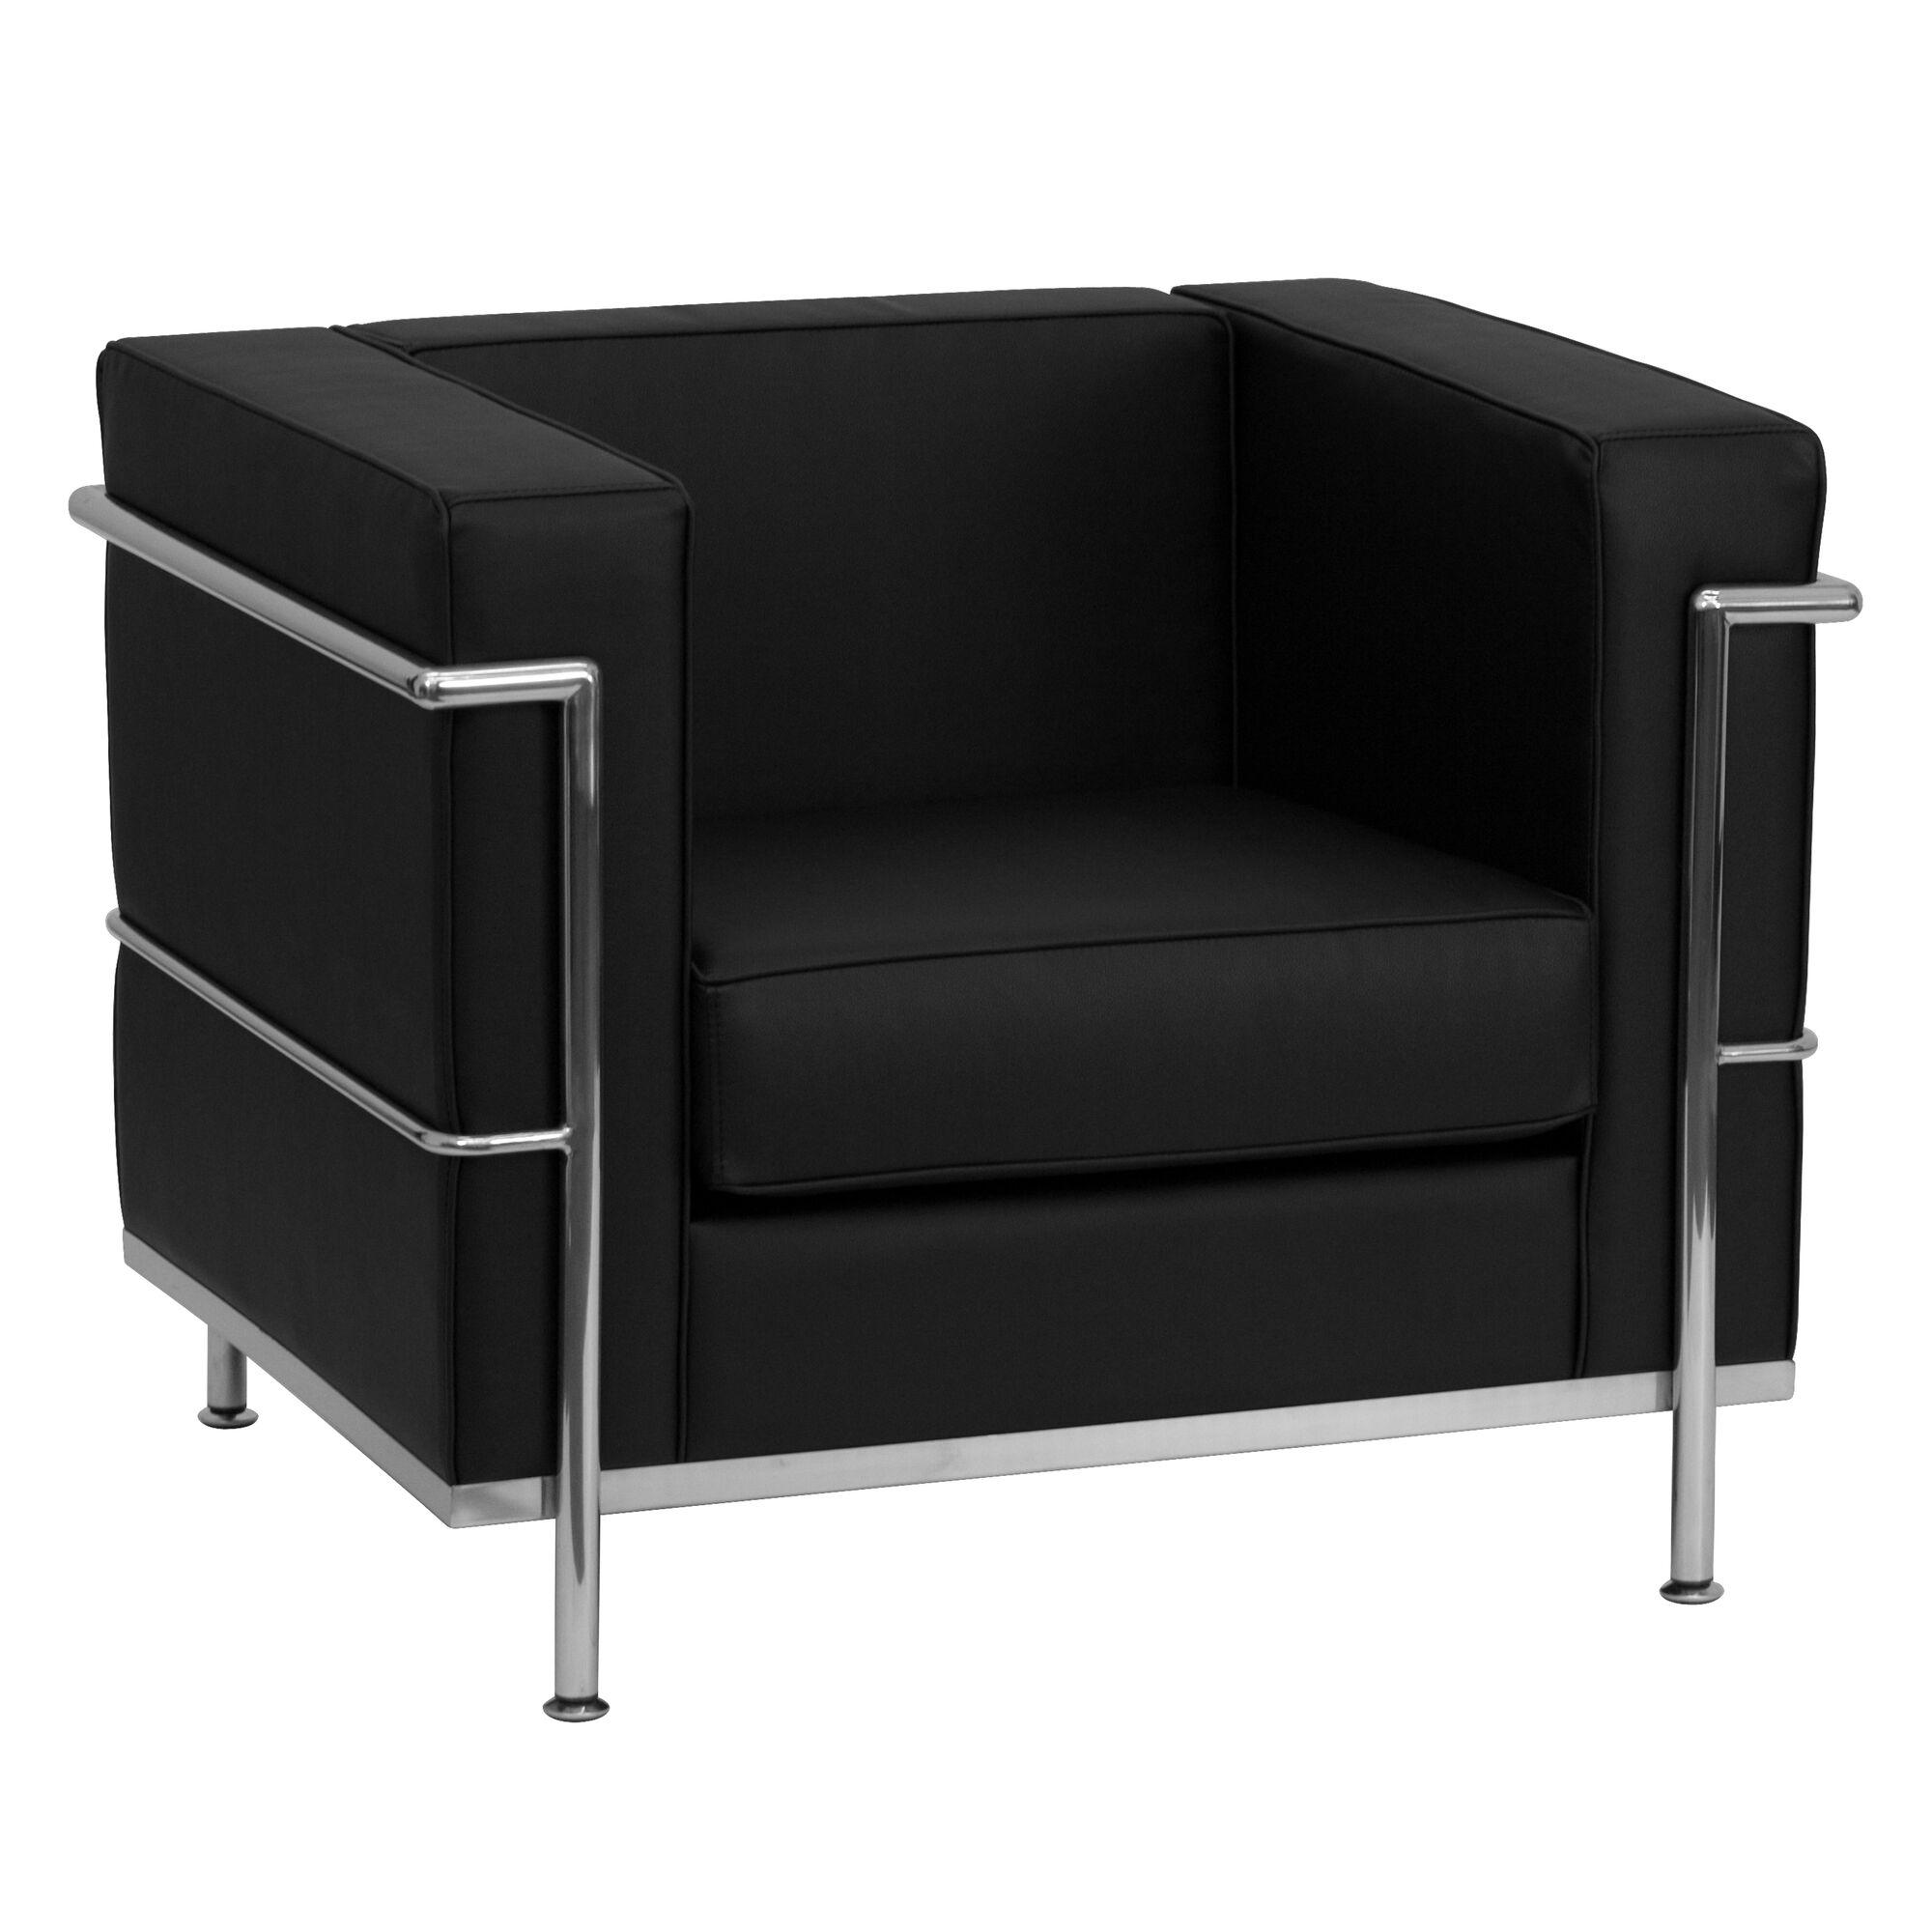 Flash Furniture Hercules Regal Series Contemporary Black